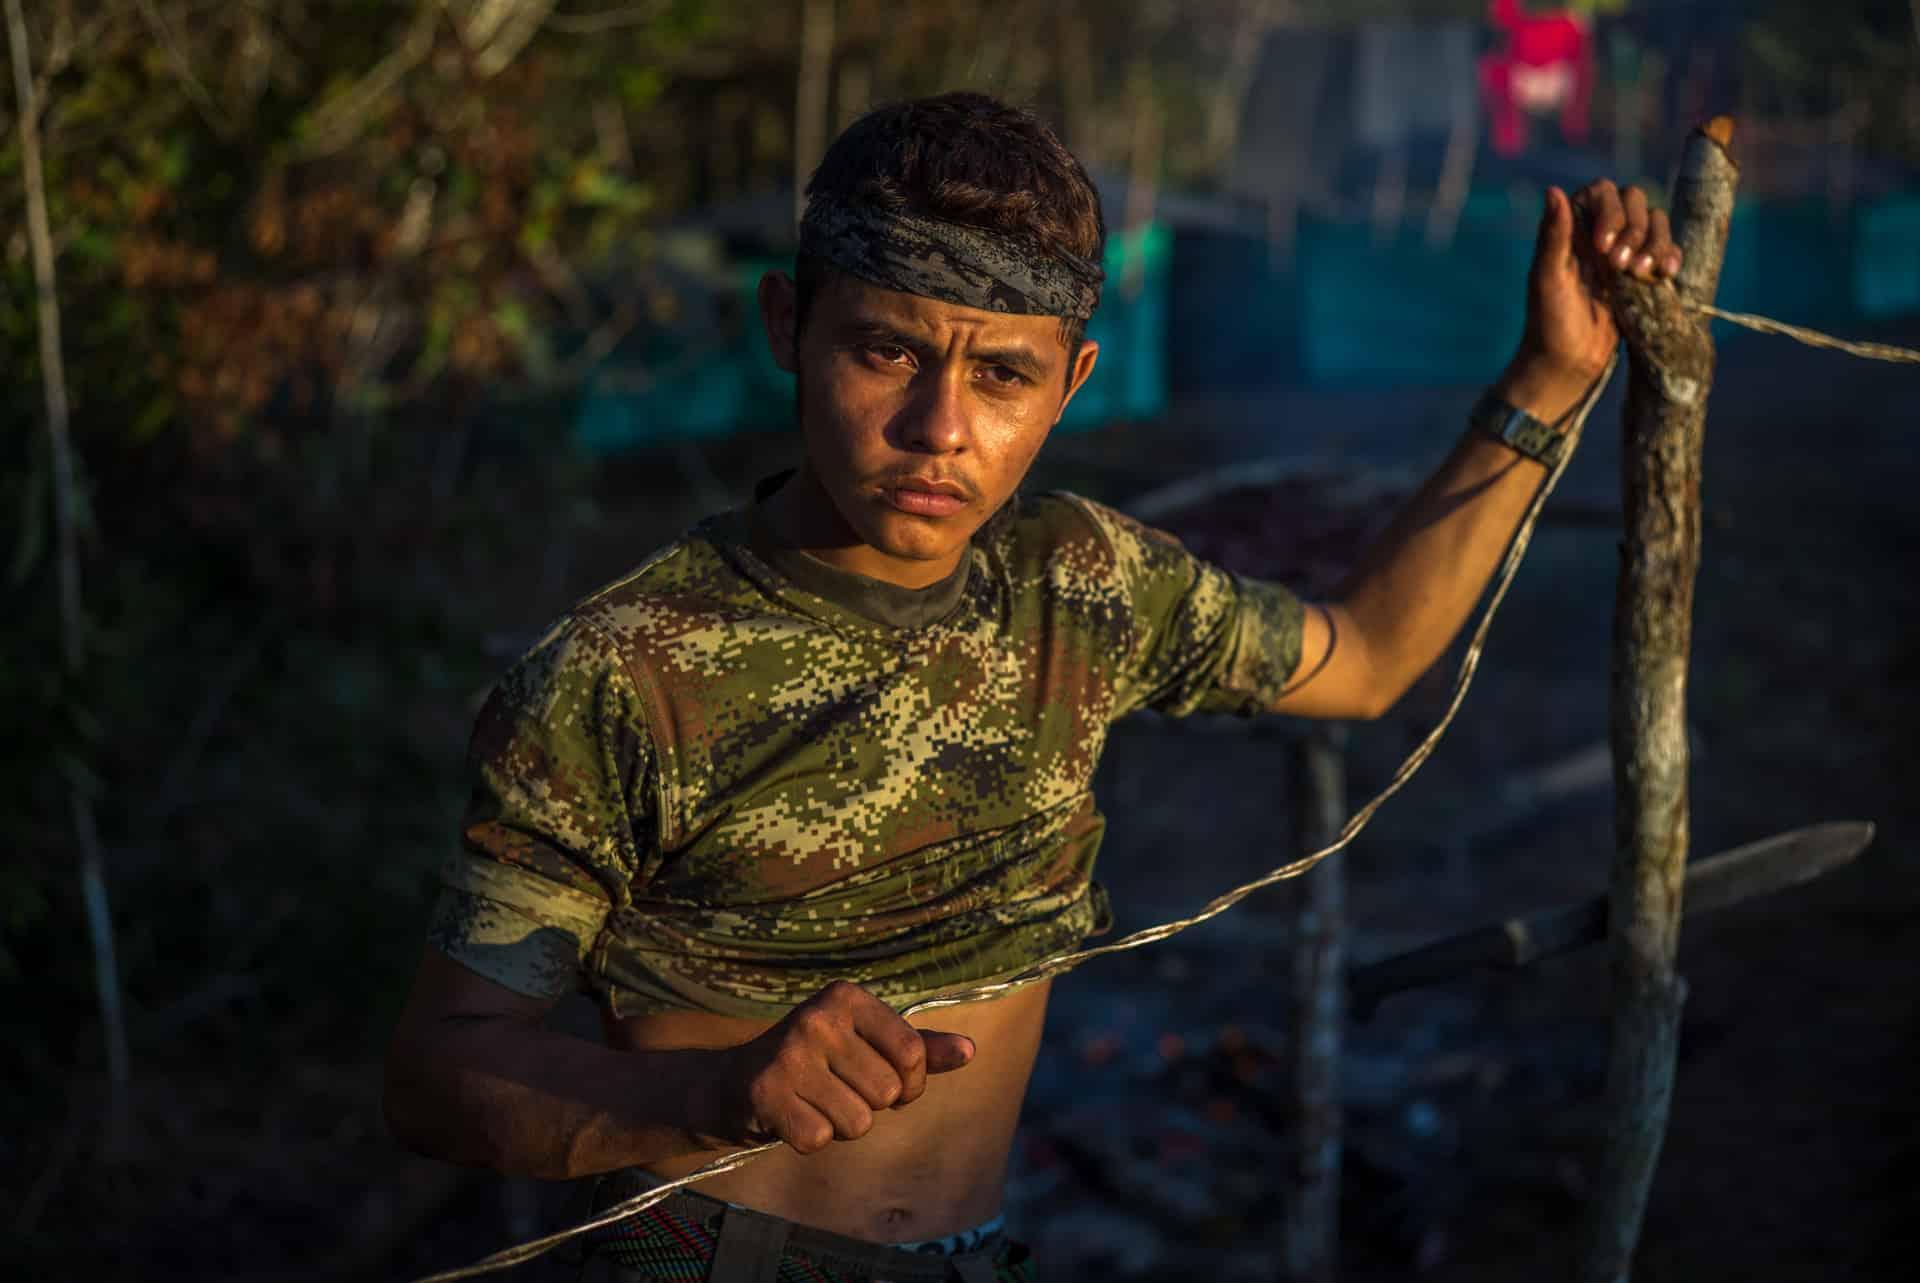 Arredondo_Juan_Photojournalism_FARC_012